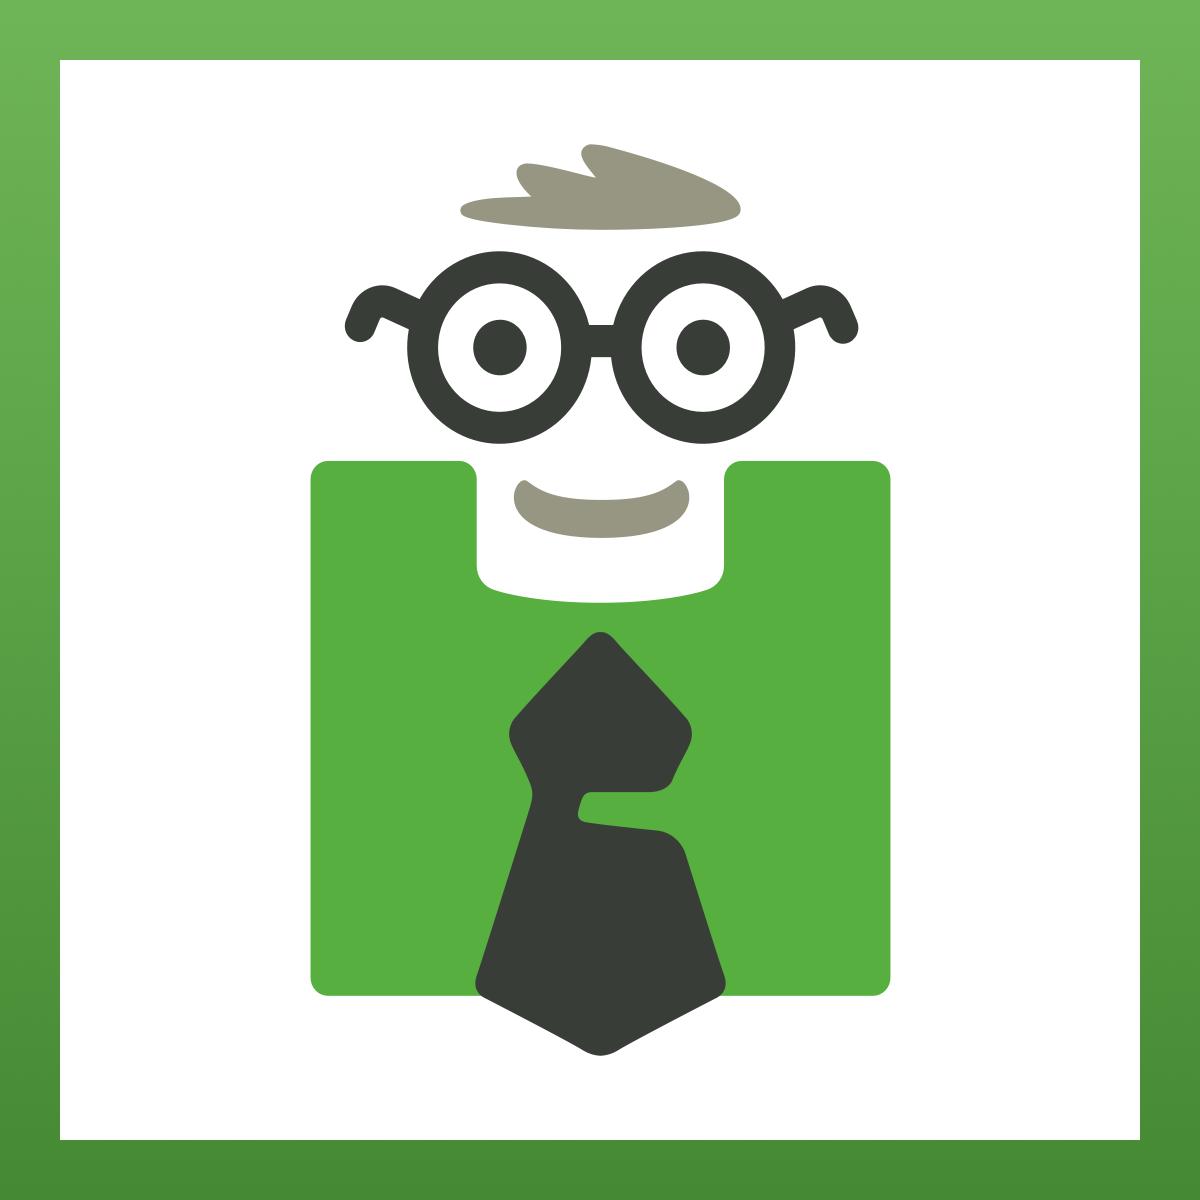 Shopify Tax app by Hurdlr, inc.